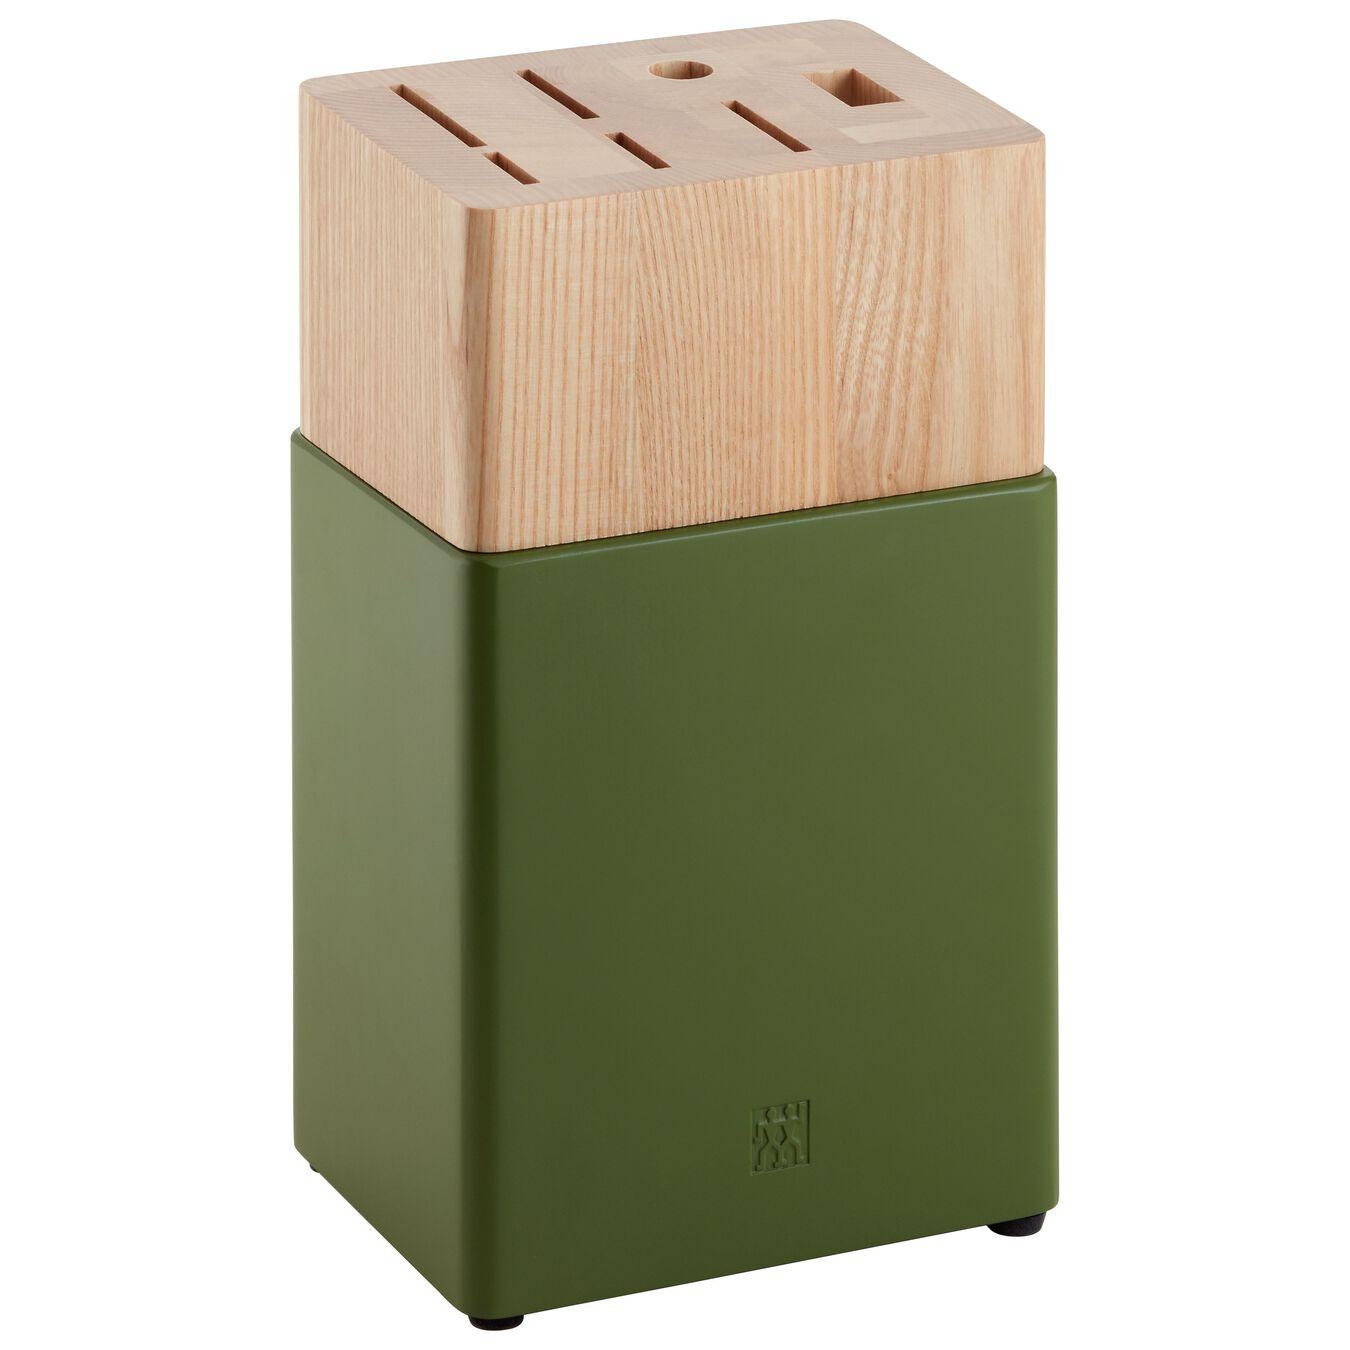 Knivblockset 8-st, Grön,,large 9